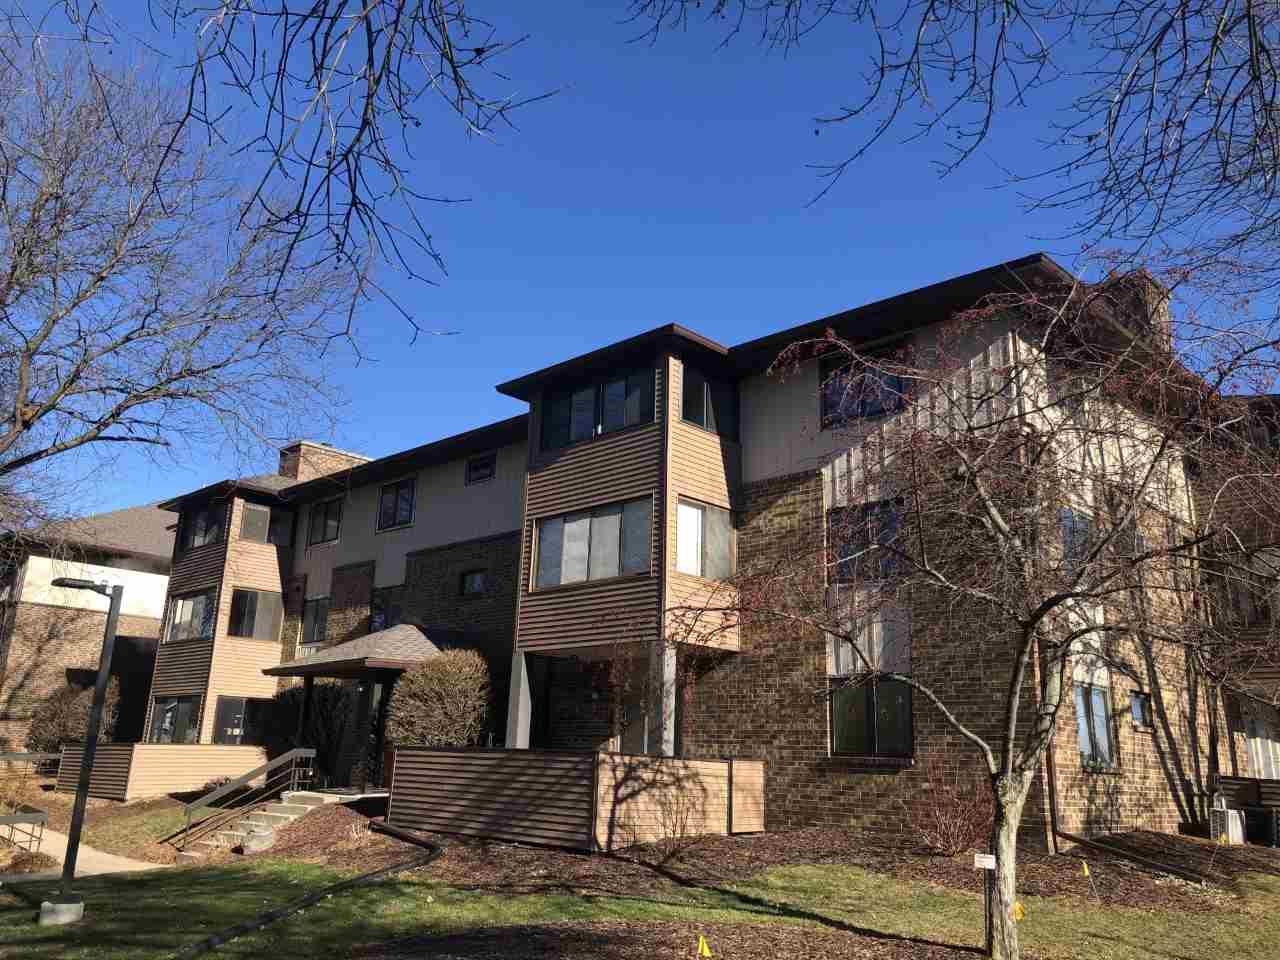 6 Maple Wood Ln #9, Madison, WI 53704 - #: 1898778